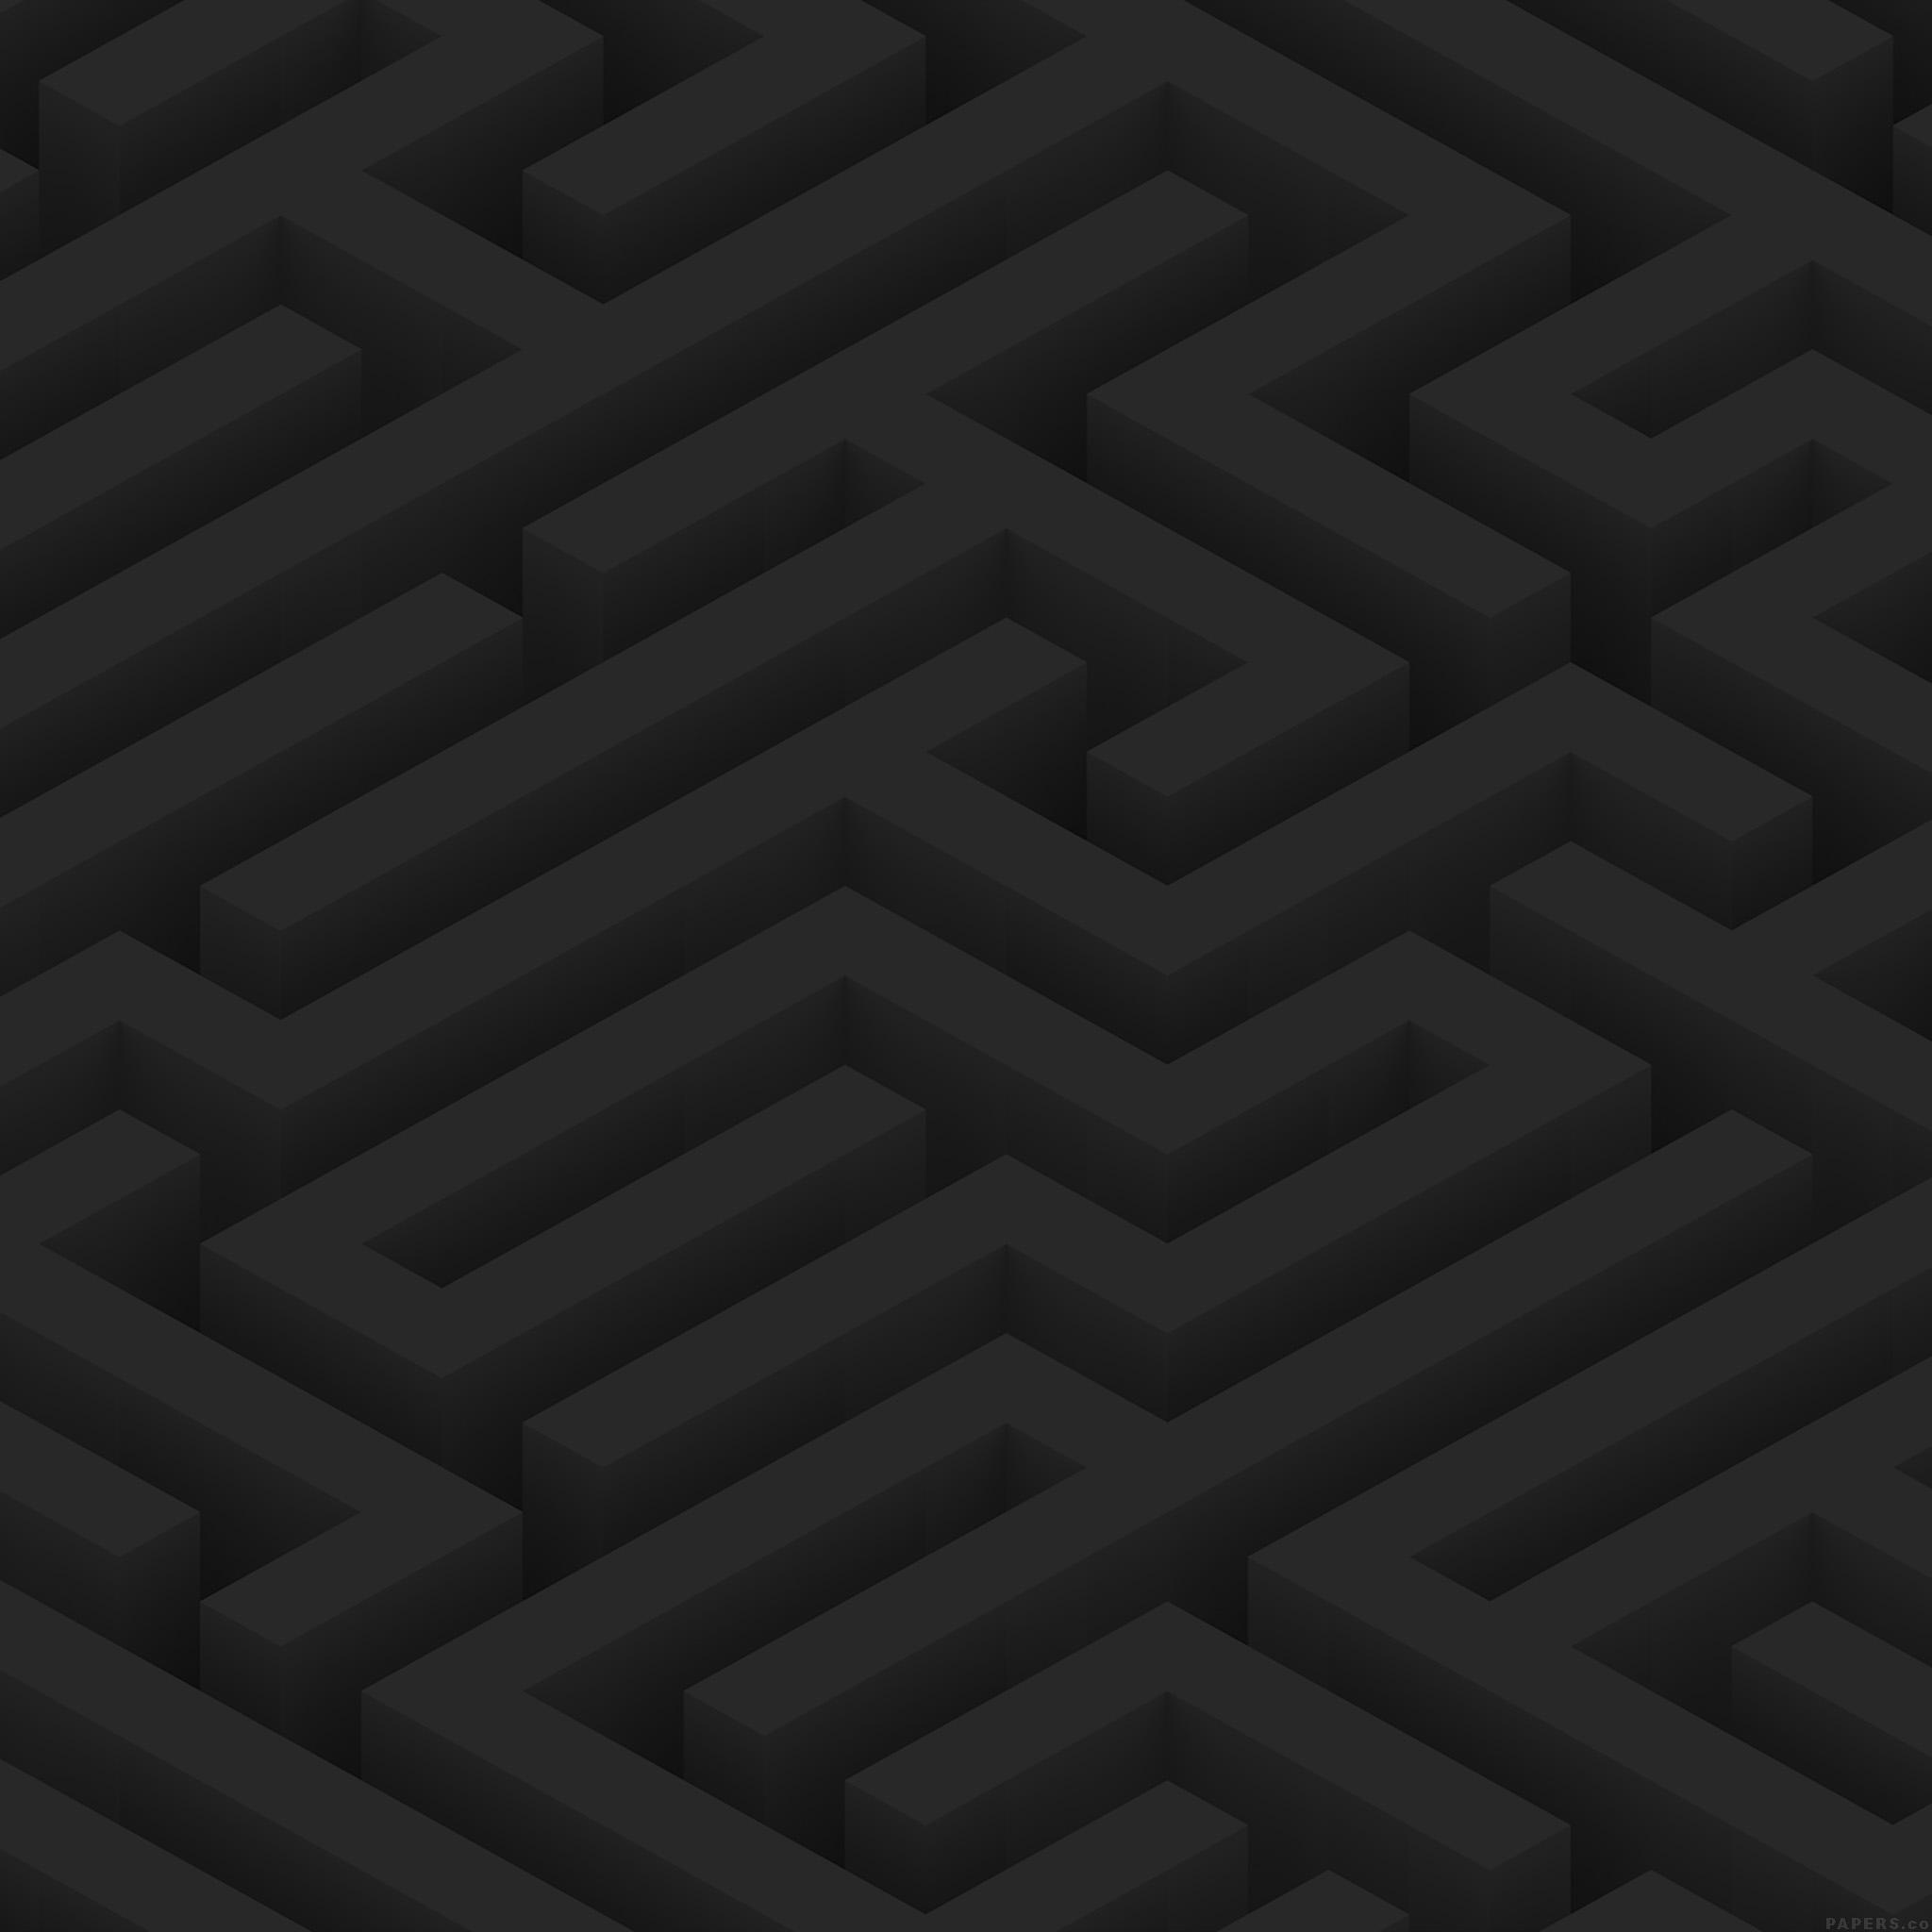 Ve67-maze-art-dark-abstract-patterns - Parallax